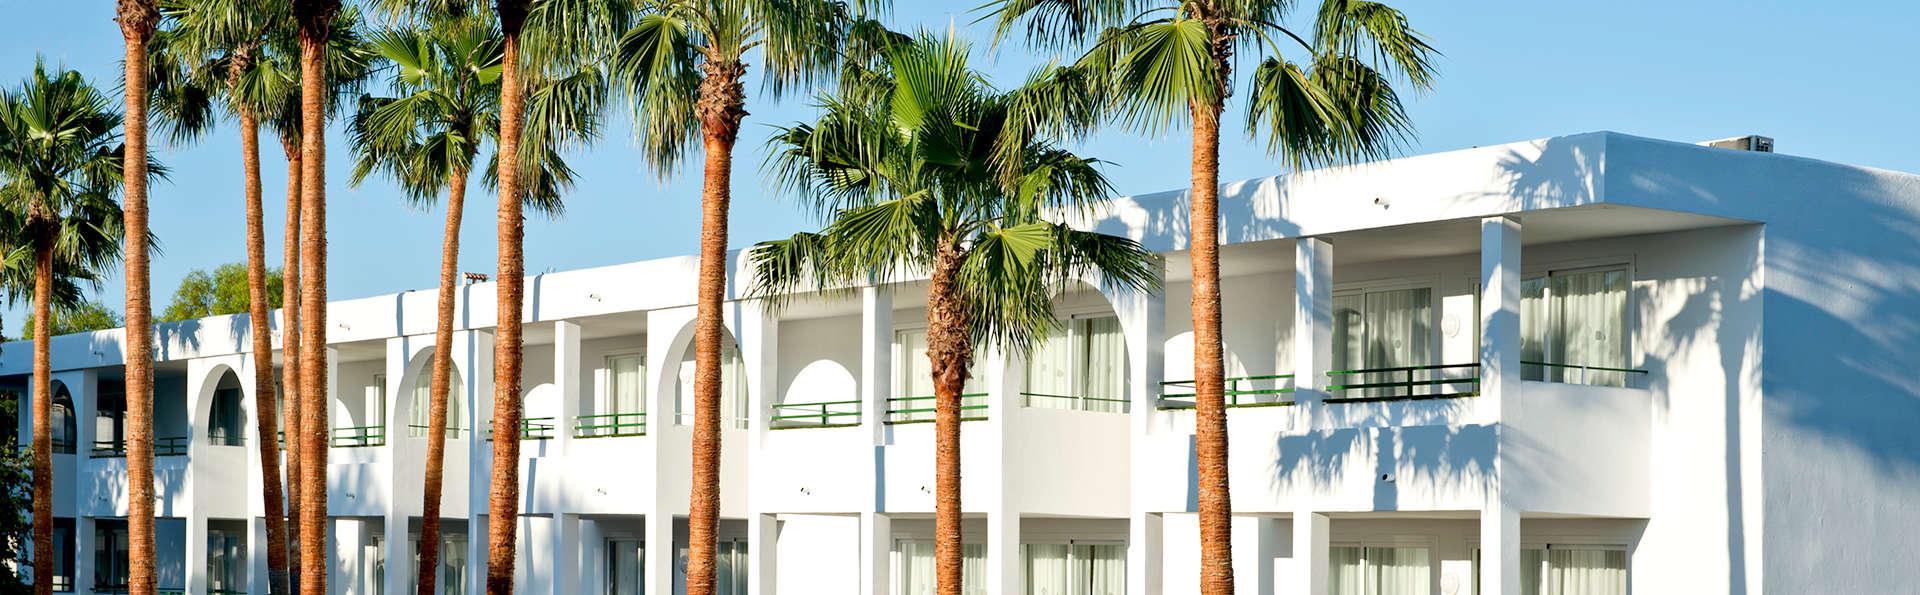 Aparthotel Pierre & Vacances Mallorca Cecilia - EDIT_N2_FRONT2.jpg